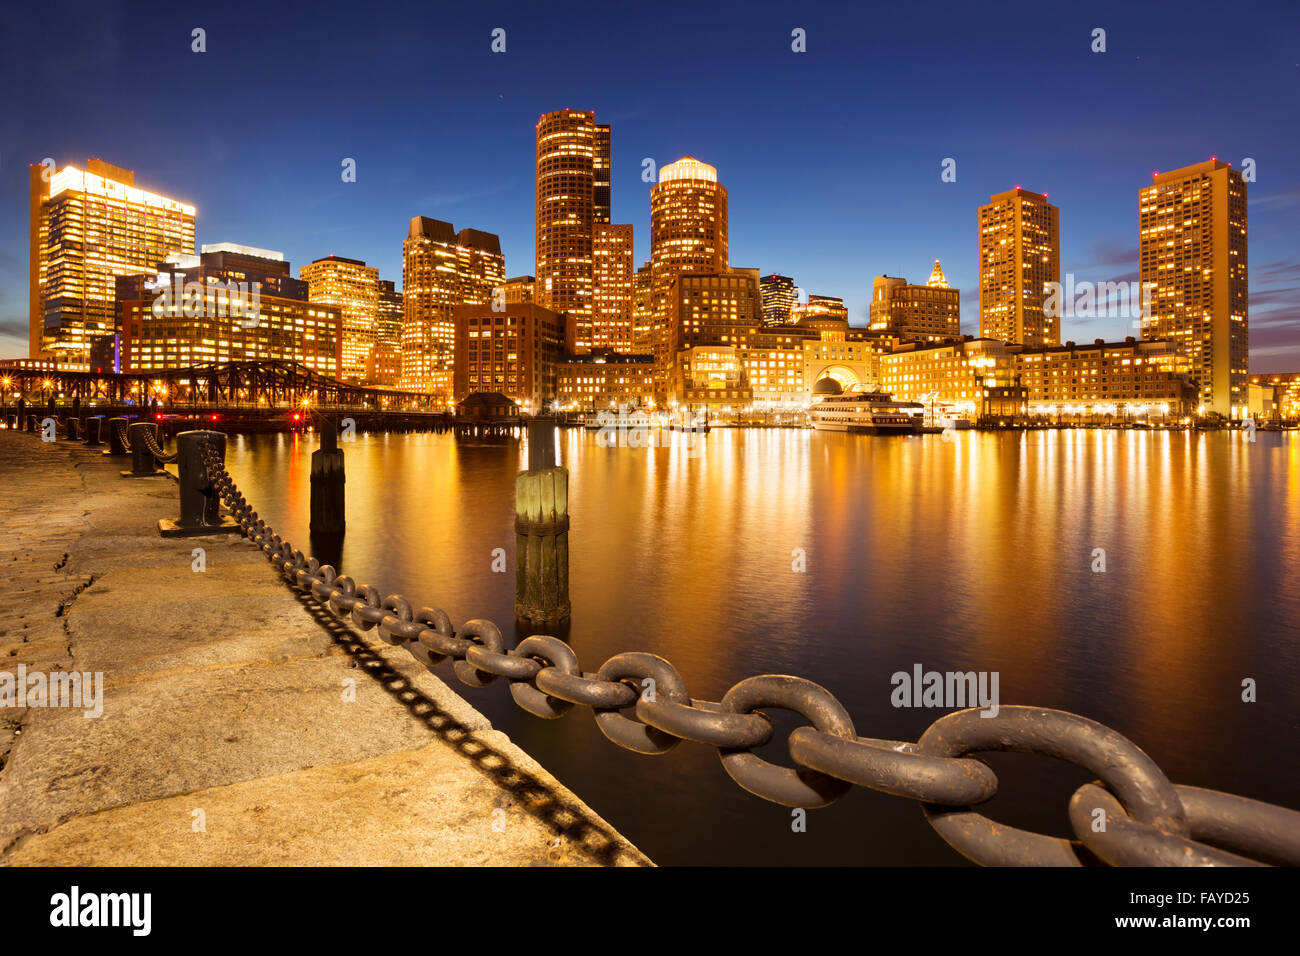 El horizonte del centro de Boston, Massachusetts a través del agua al atardecer. Imagen De Stock